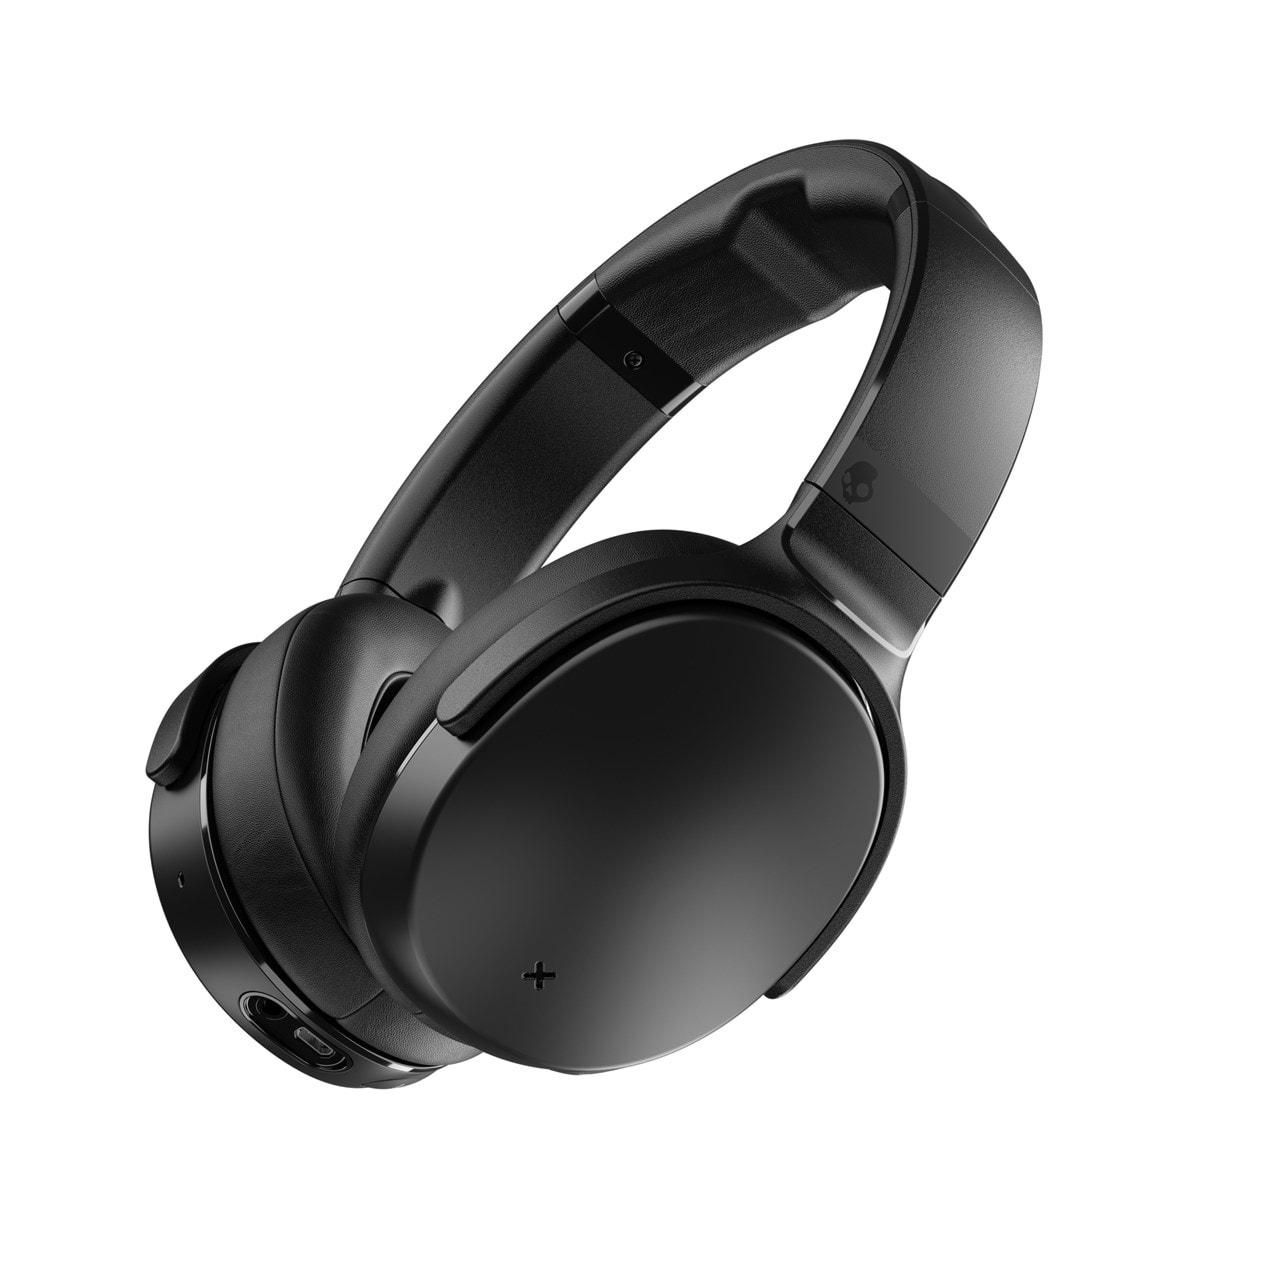 Skullcandy Venue Black Active Noise Cancelling Bluetooth Headphones - 2